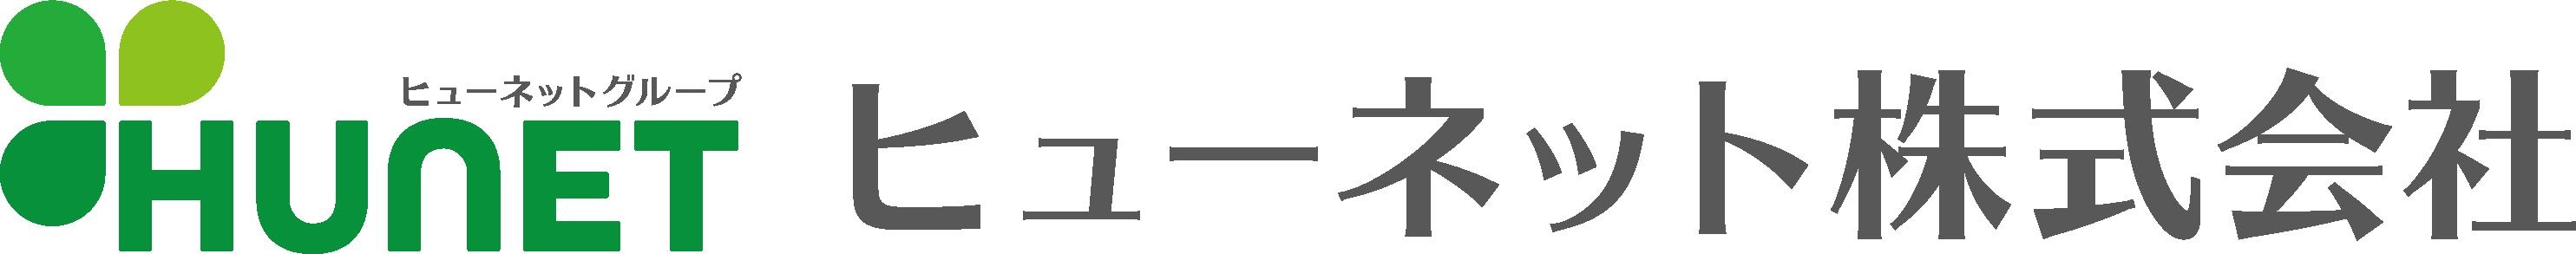 ヒューネット株式会社 | 建築建設施工会社